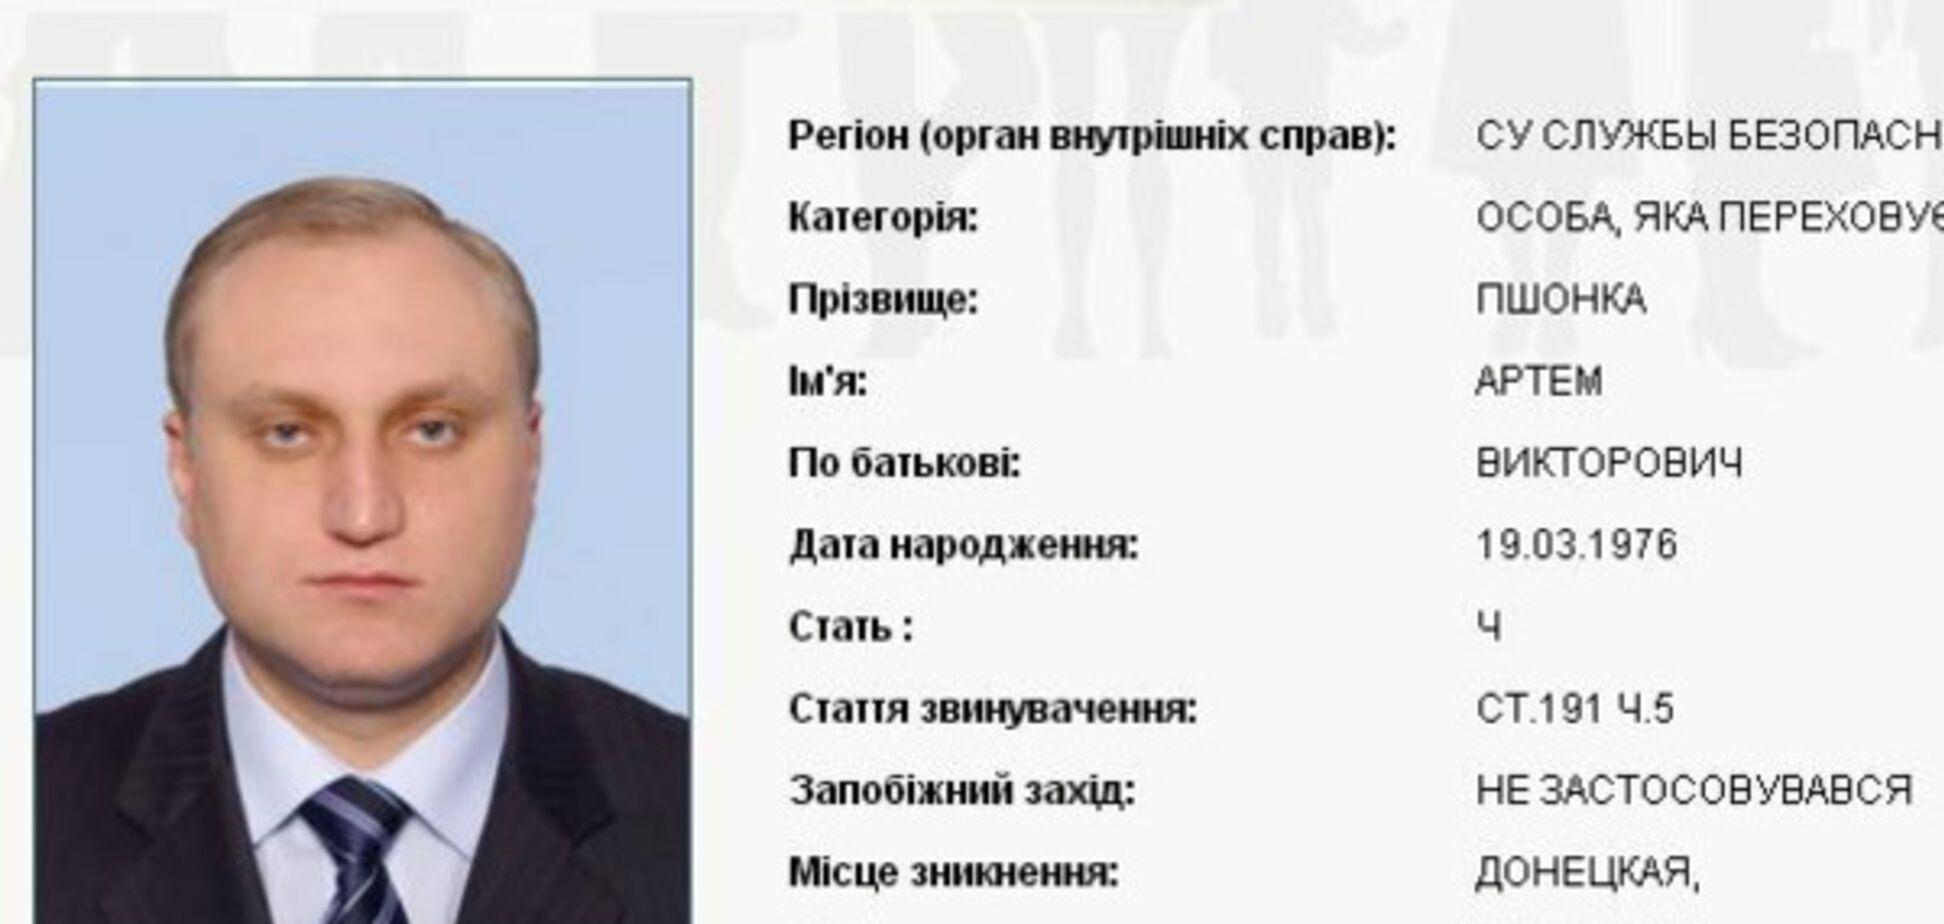 Артем Пшонка в базе розыска МВД Украины